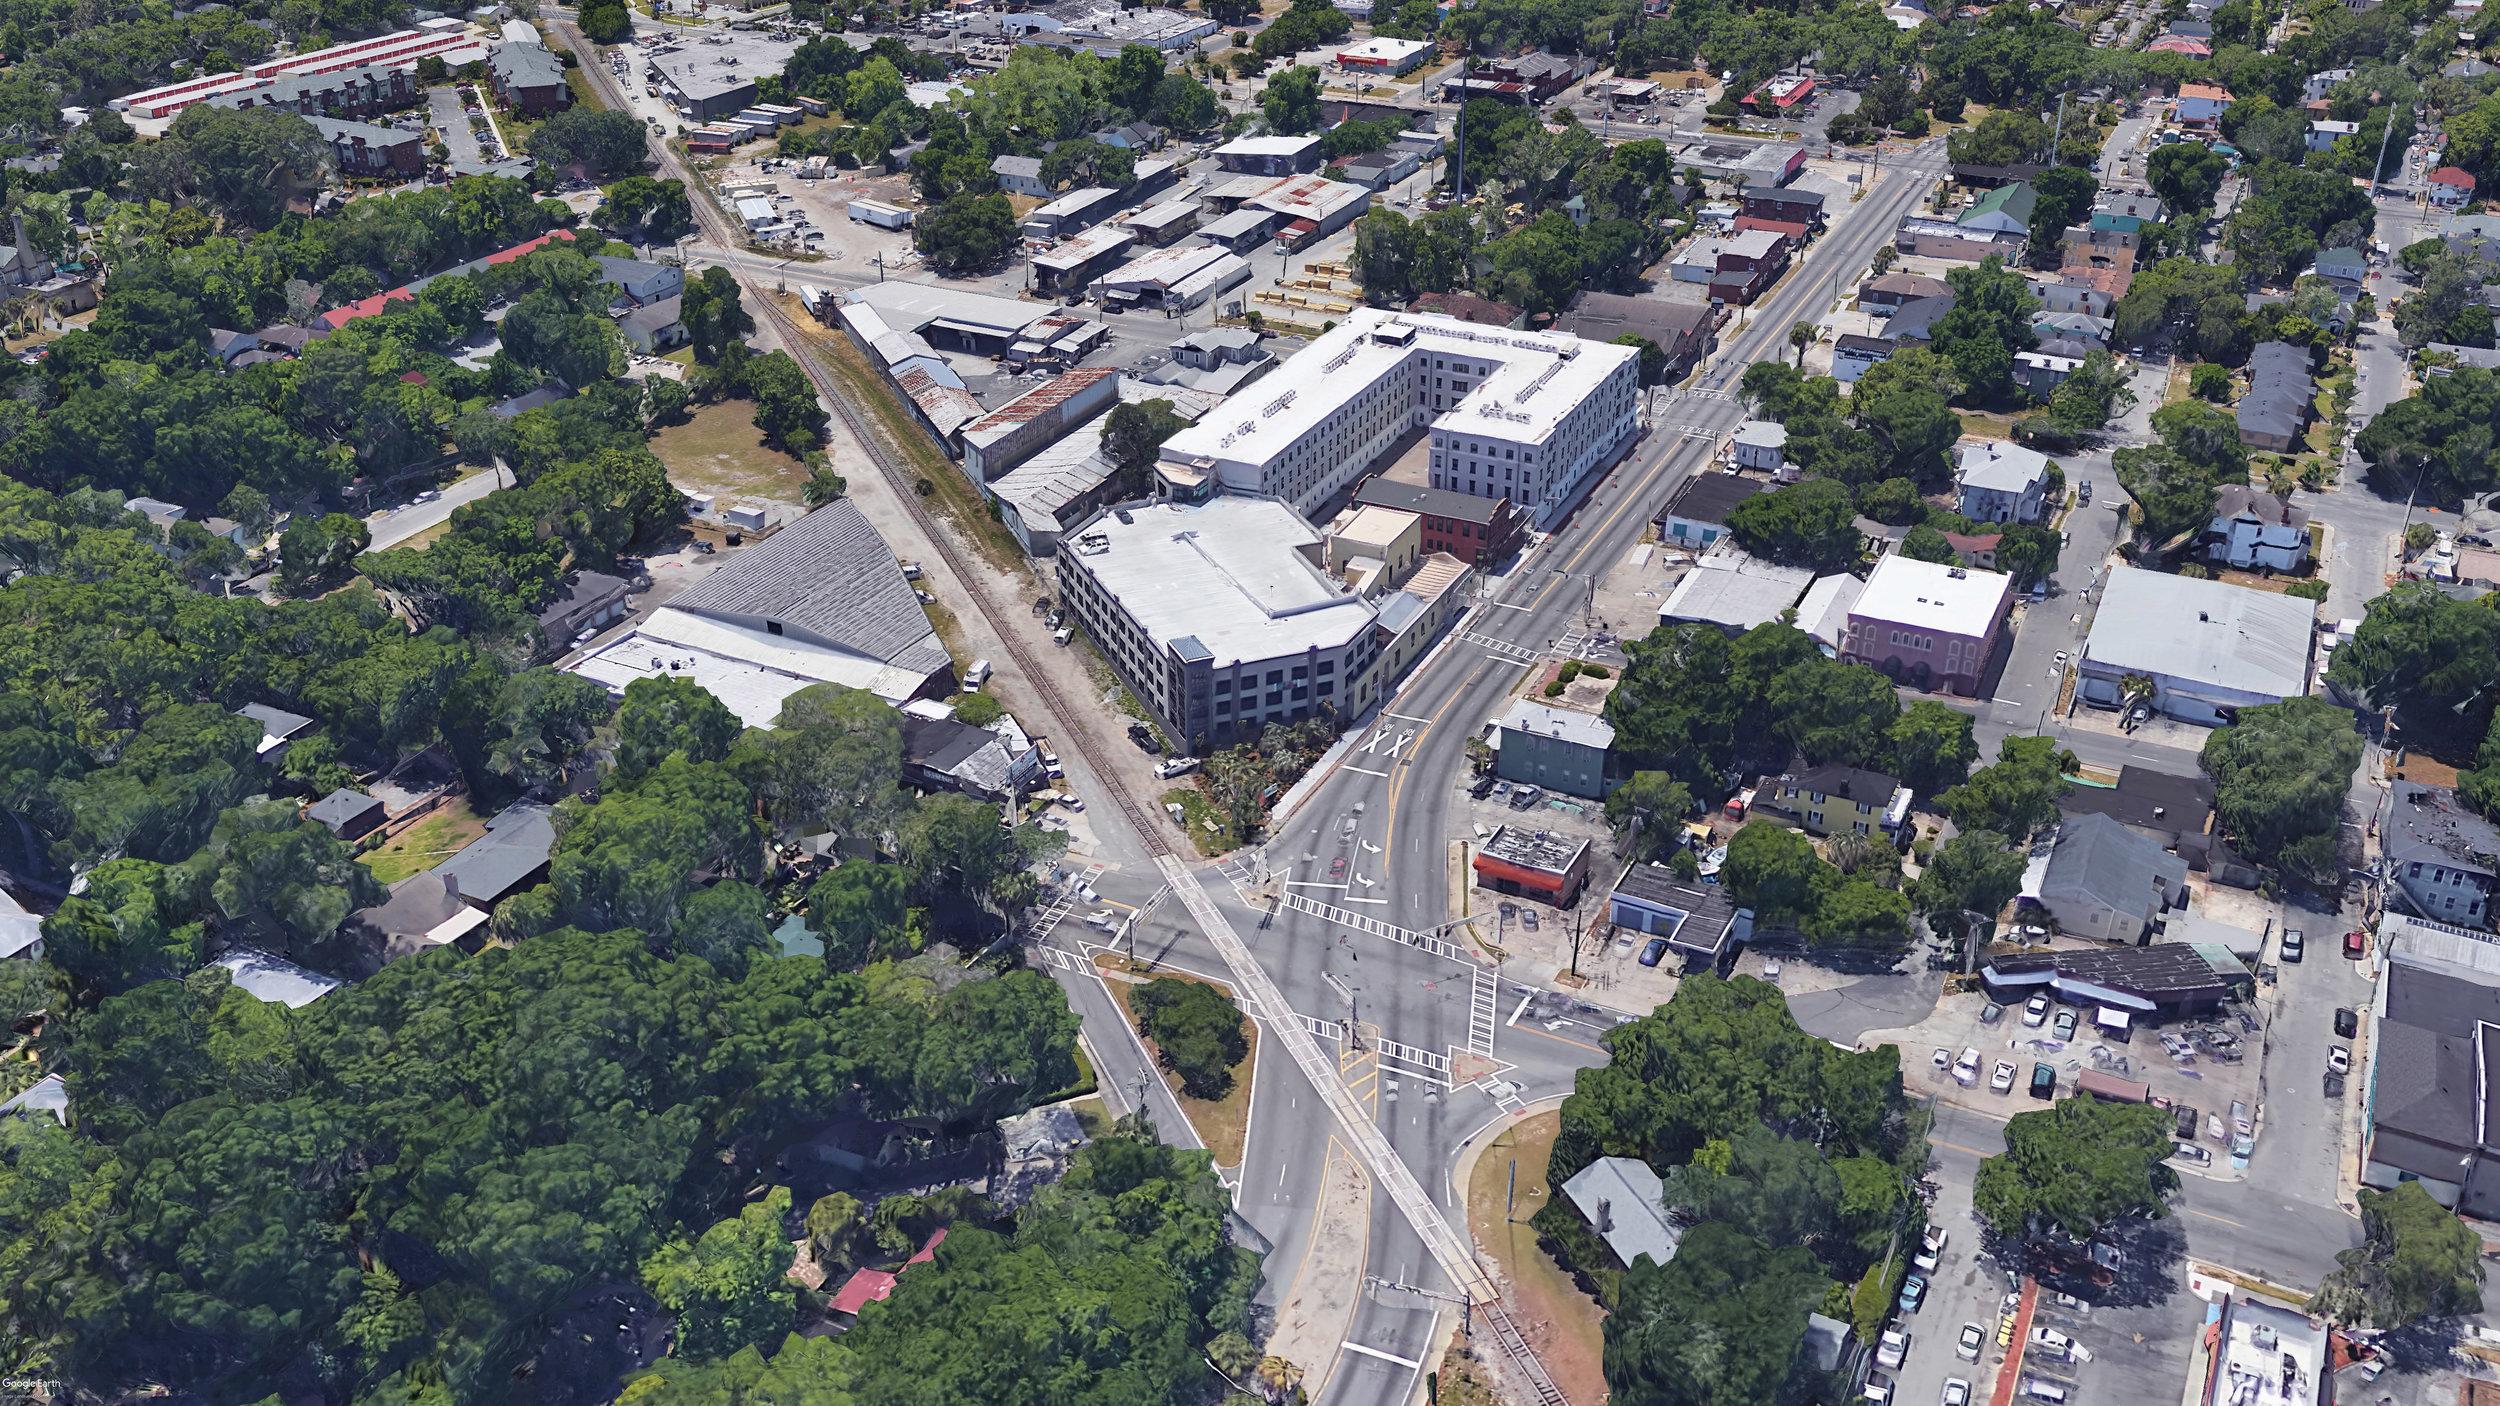 18030-Savannah_AerialVictory01-0_existing.jpg